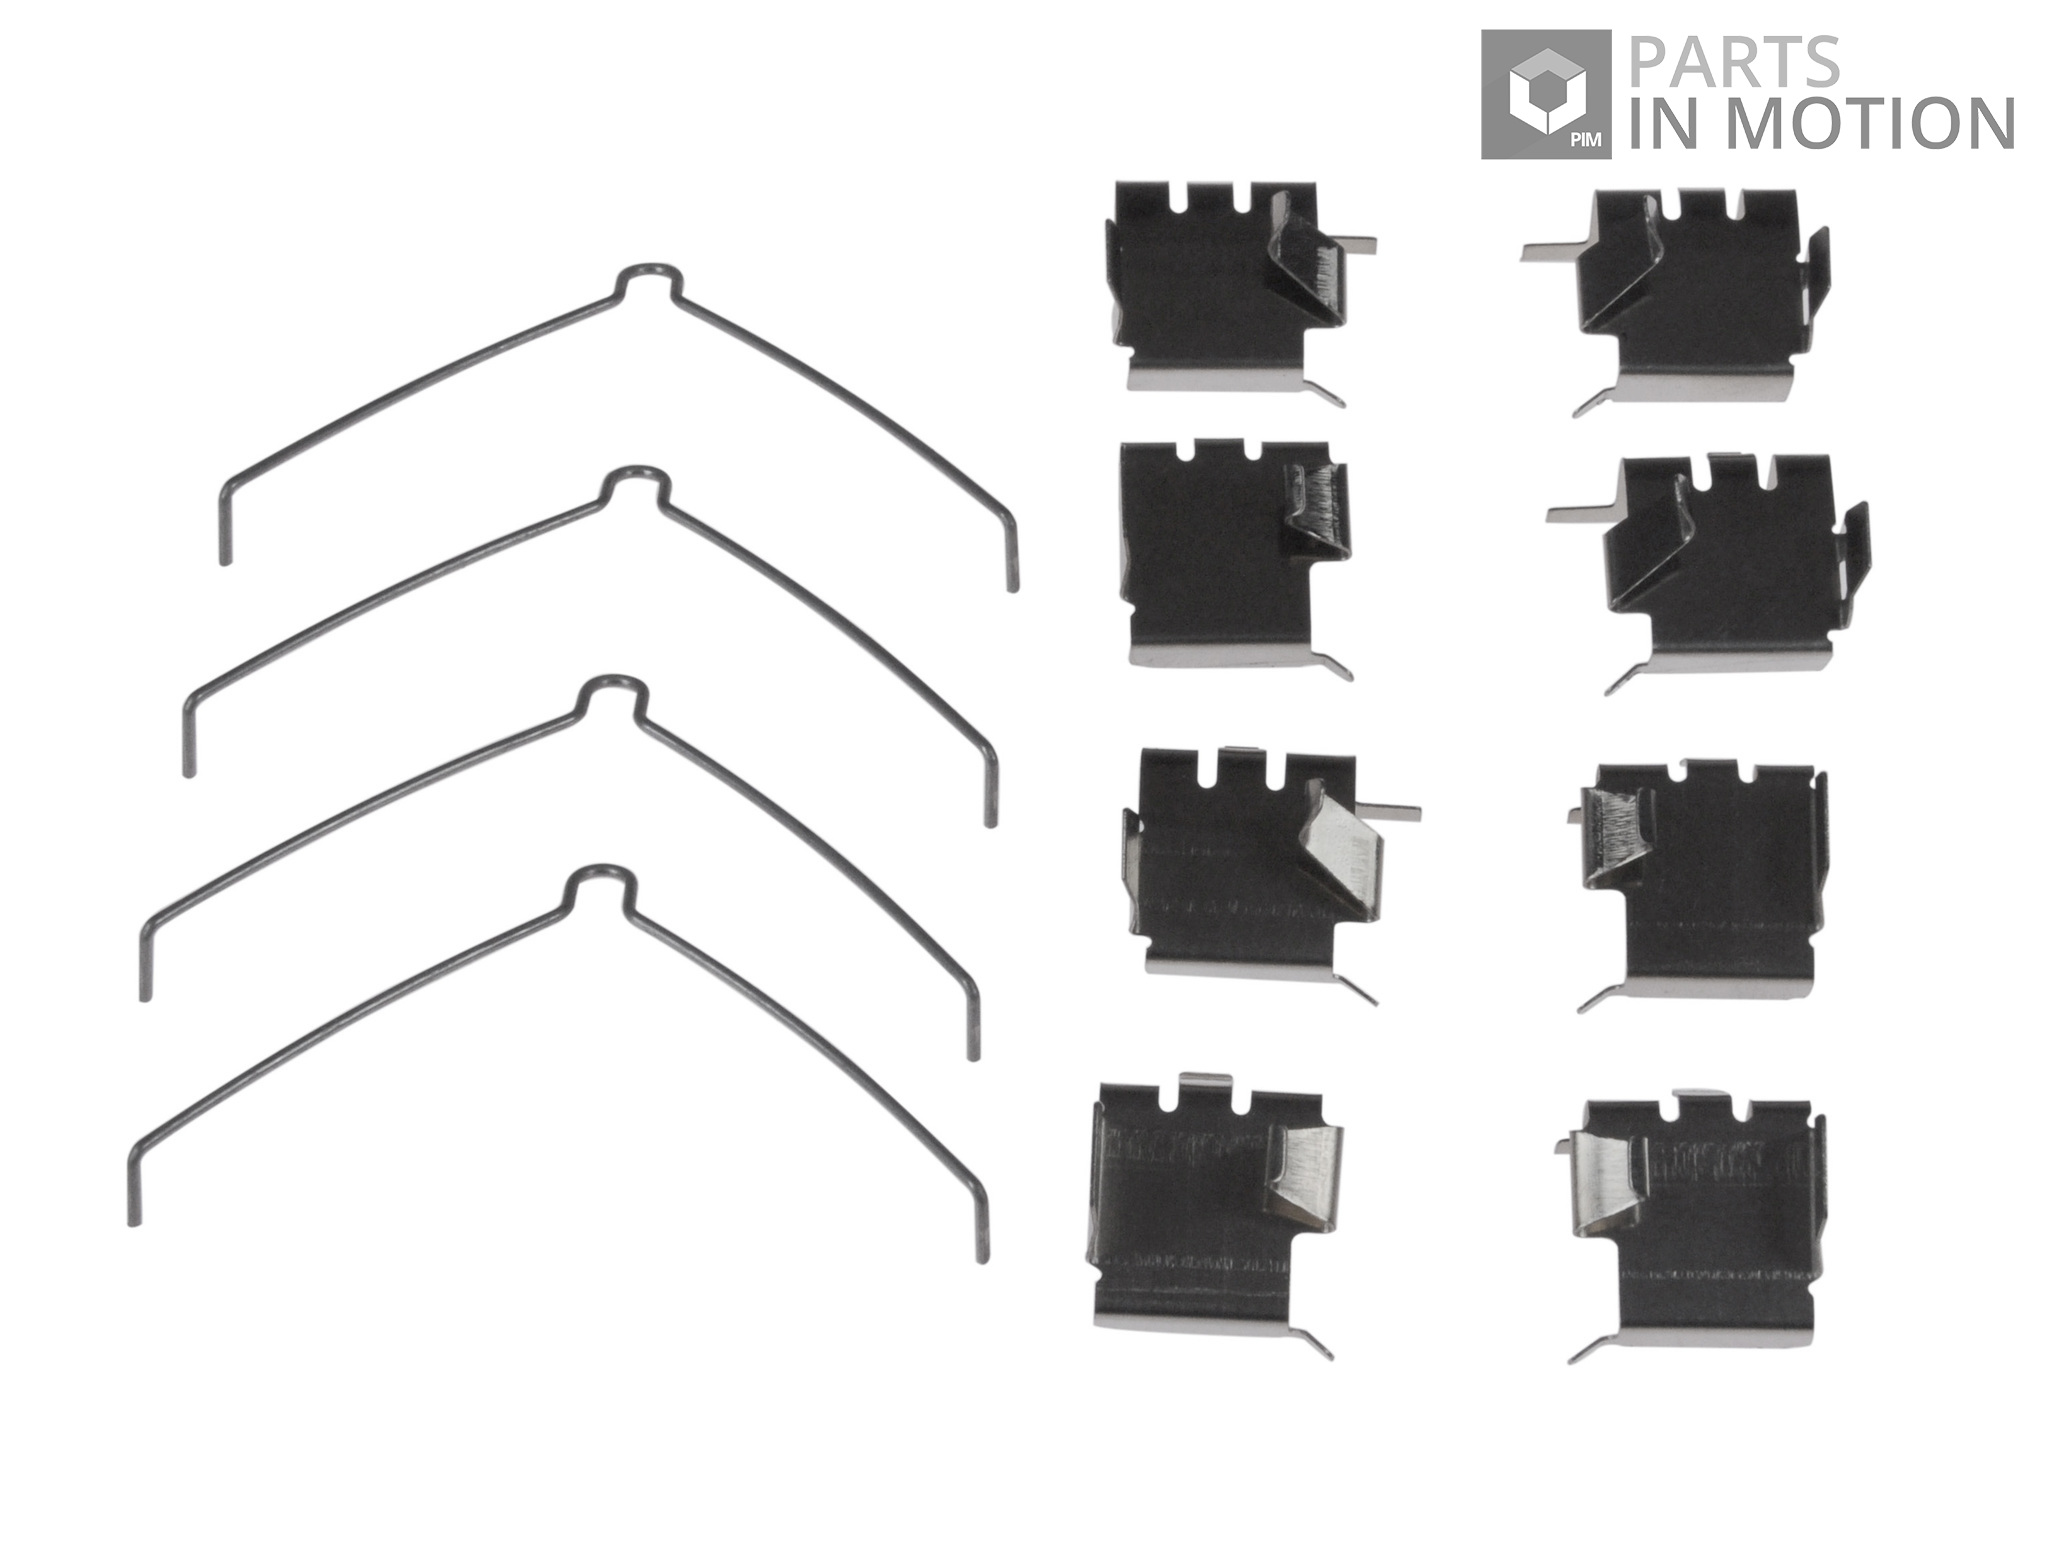 BRAND NEW GENUINE 5 YEAR WARRANTY Delphi Brake Pad Fitting Kit LX0266